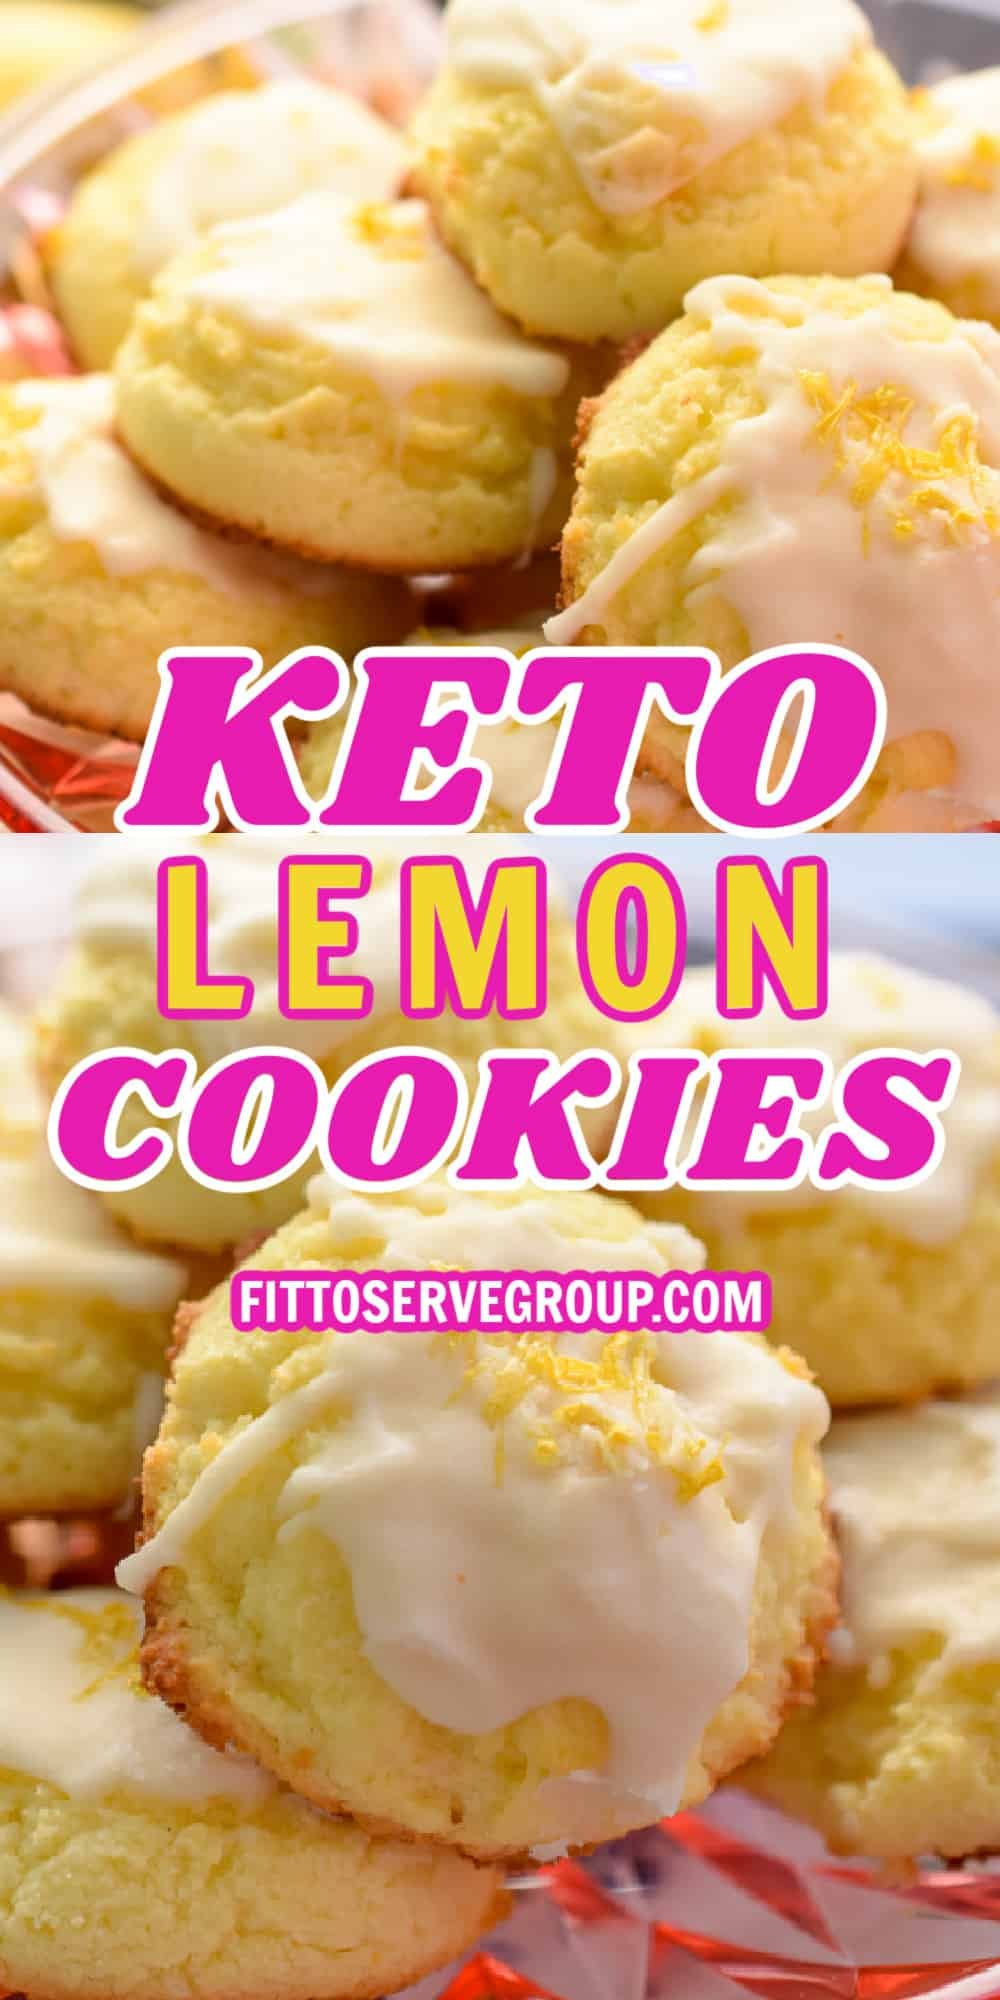 Keto lemon cookies on pink clear plates